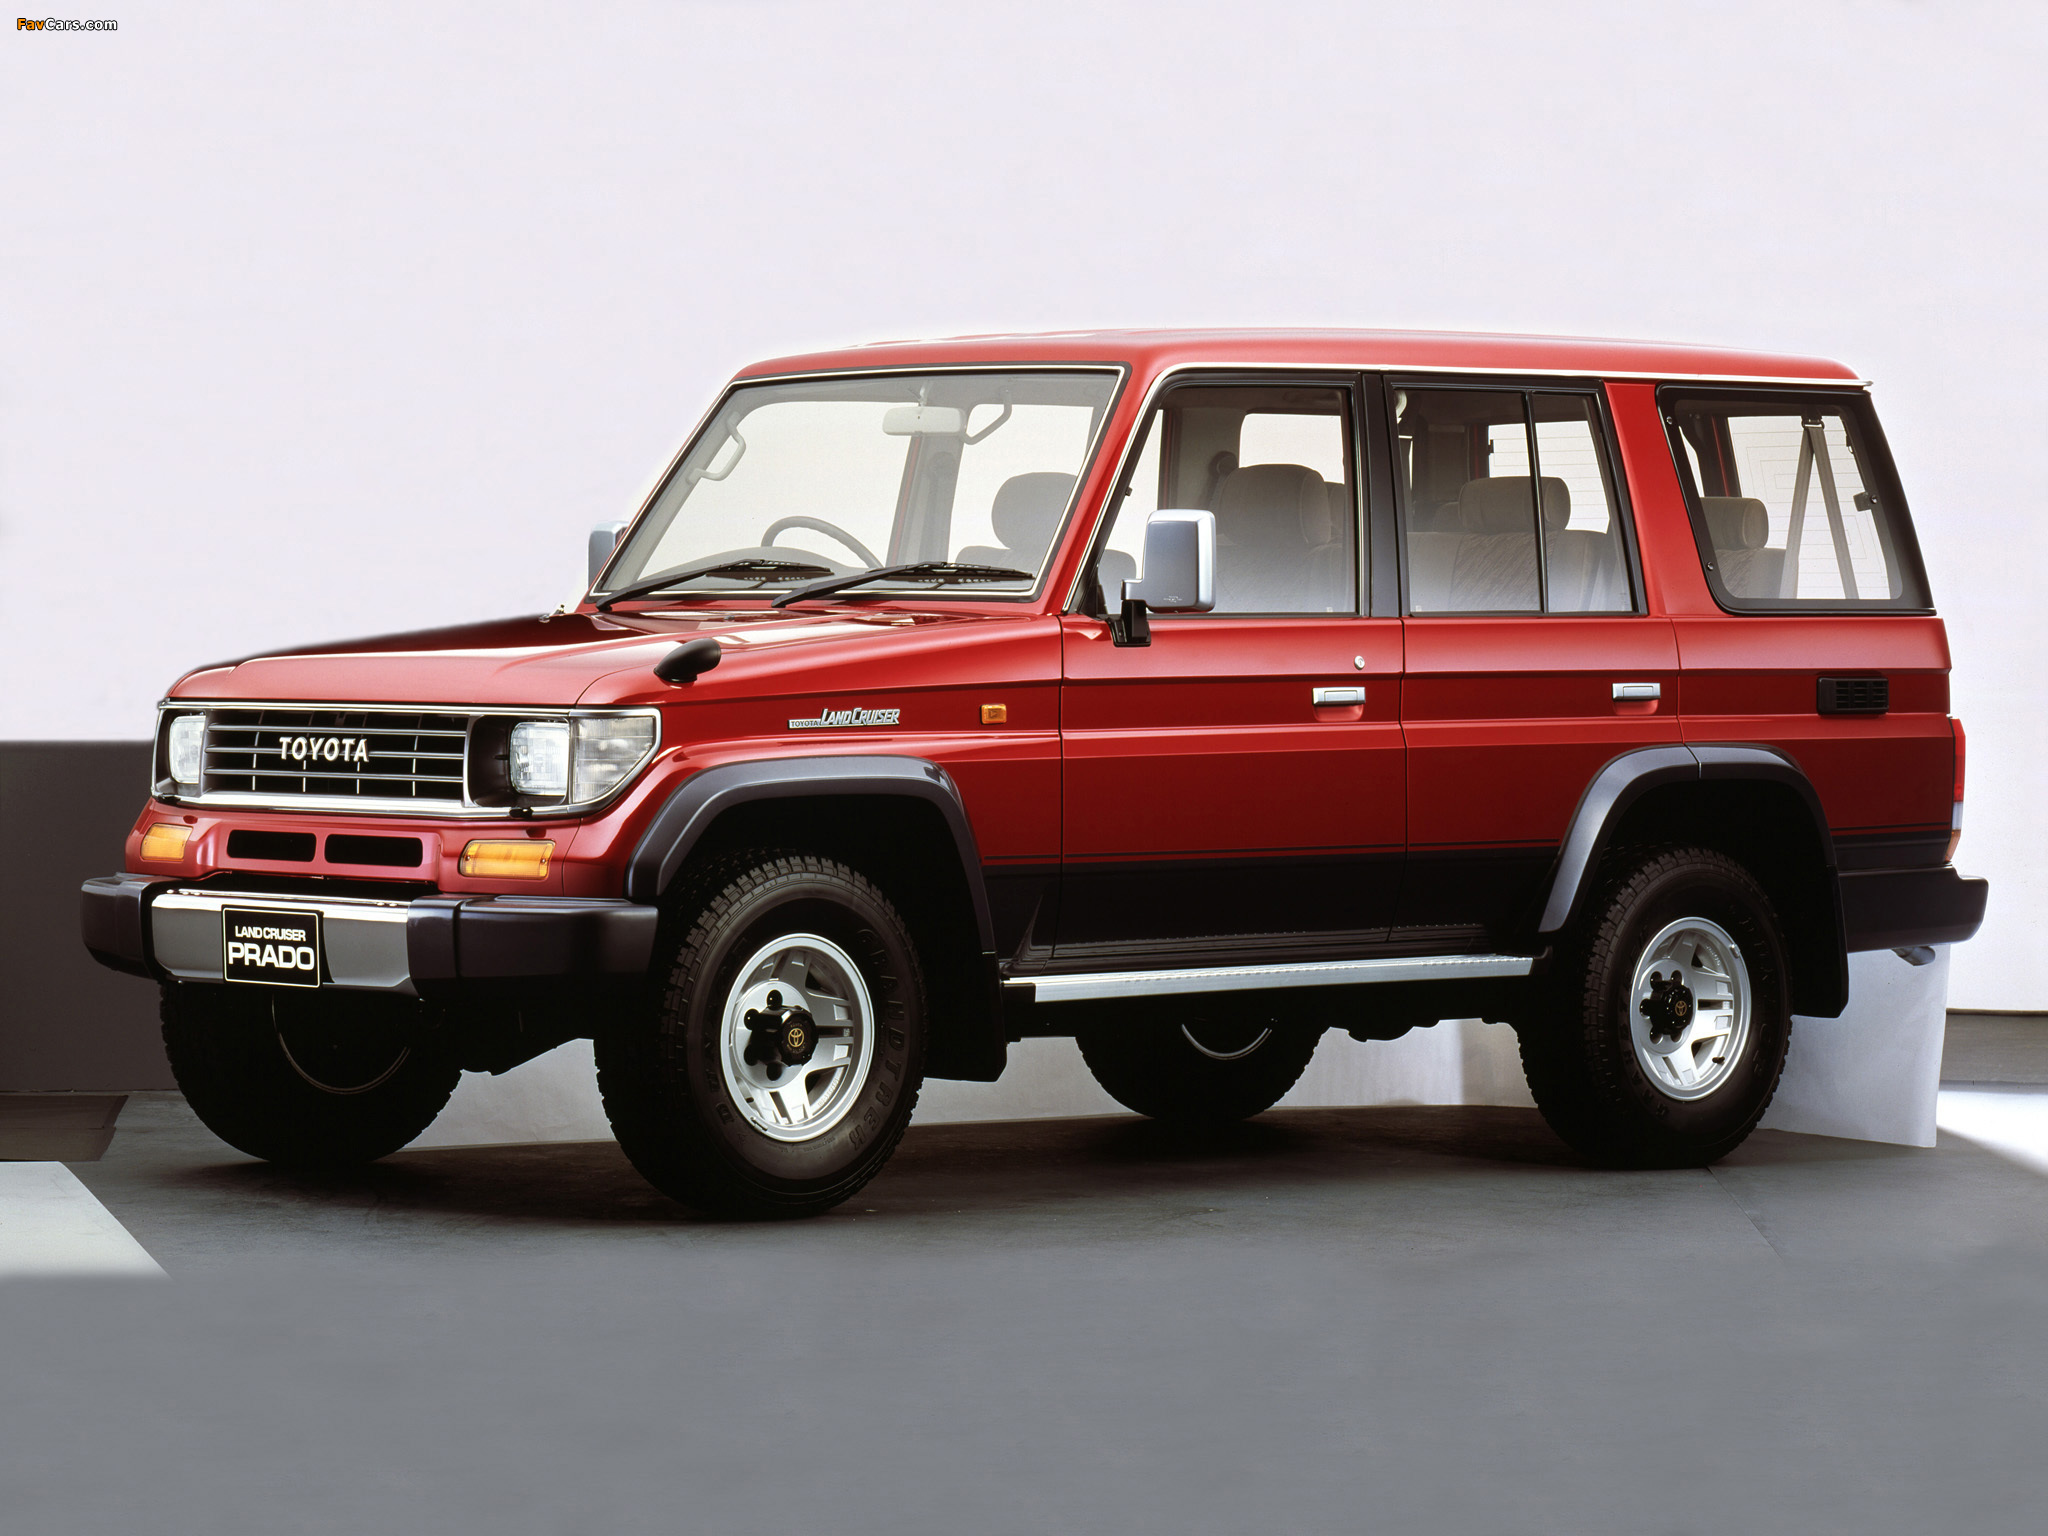 1990 Toyota Land Cruiser Image 8